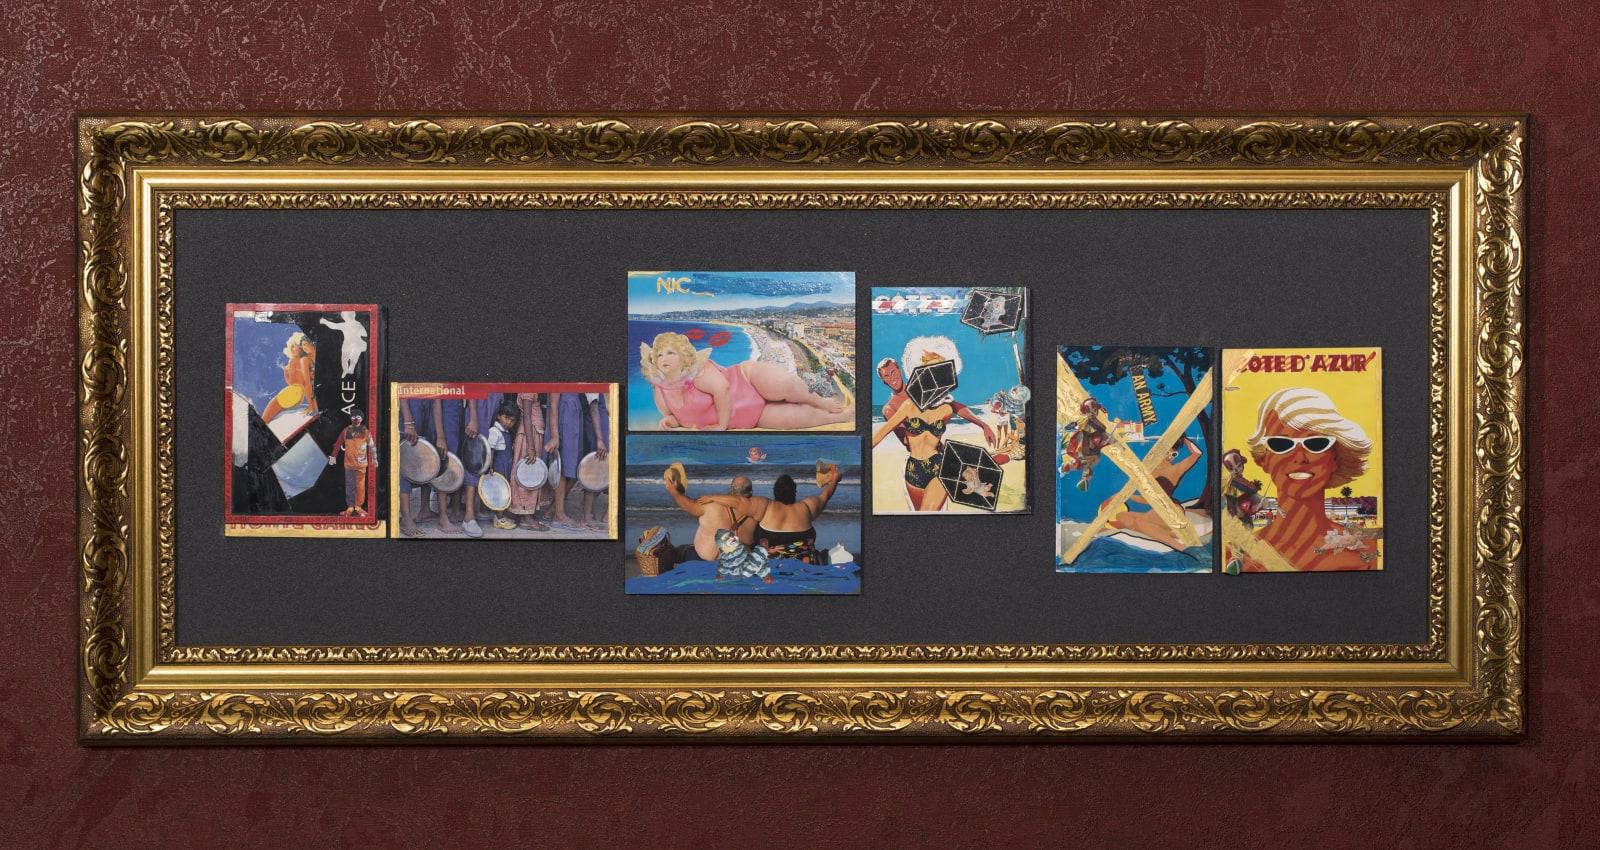 Pleasure 2020 postcards and mixed media 93 x 40 cm